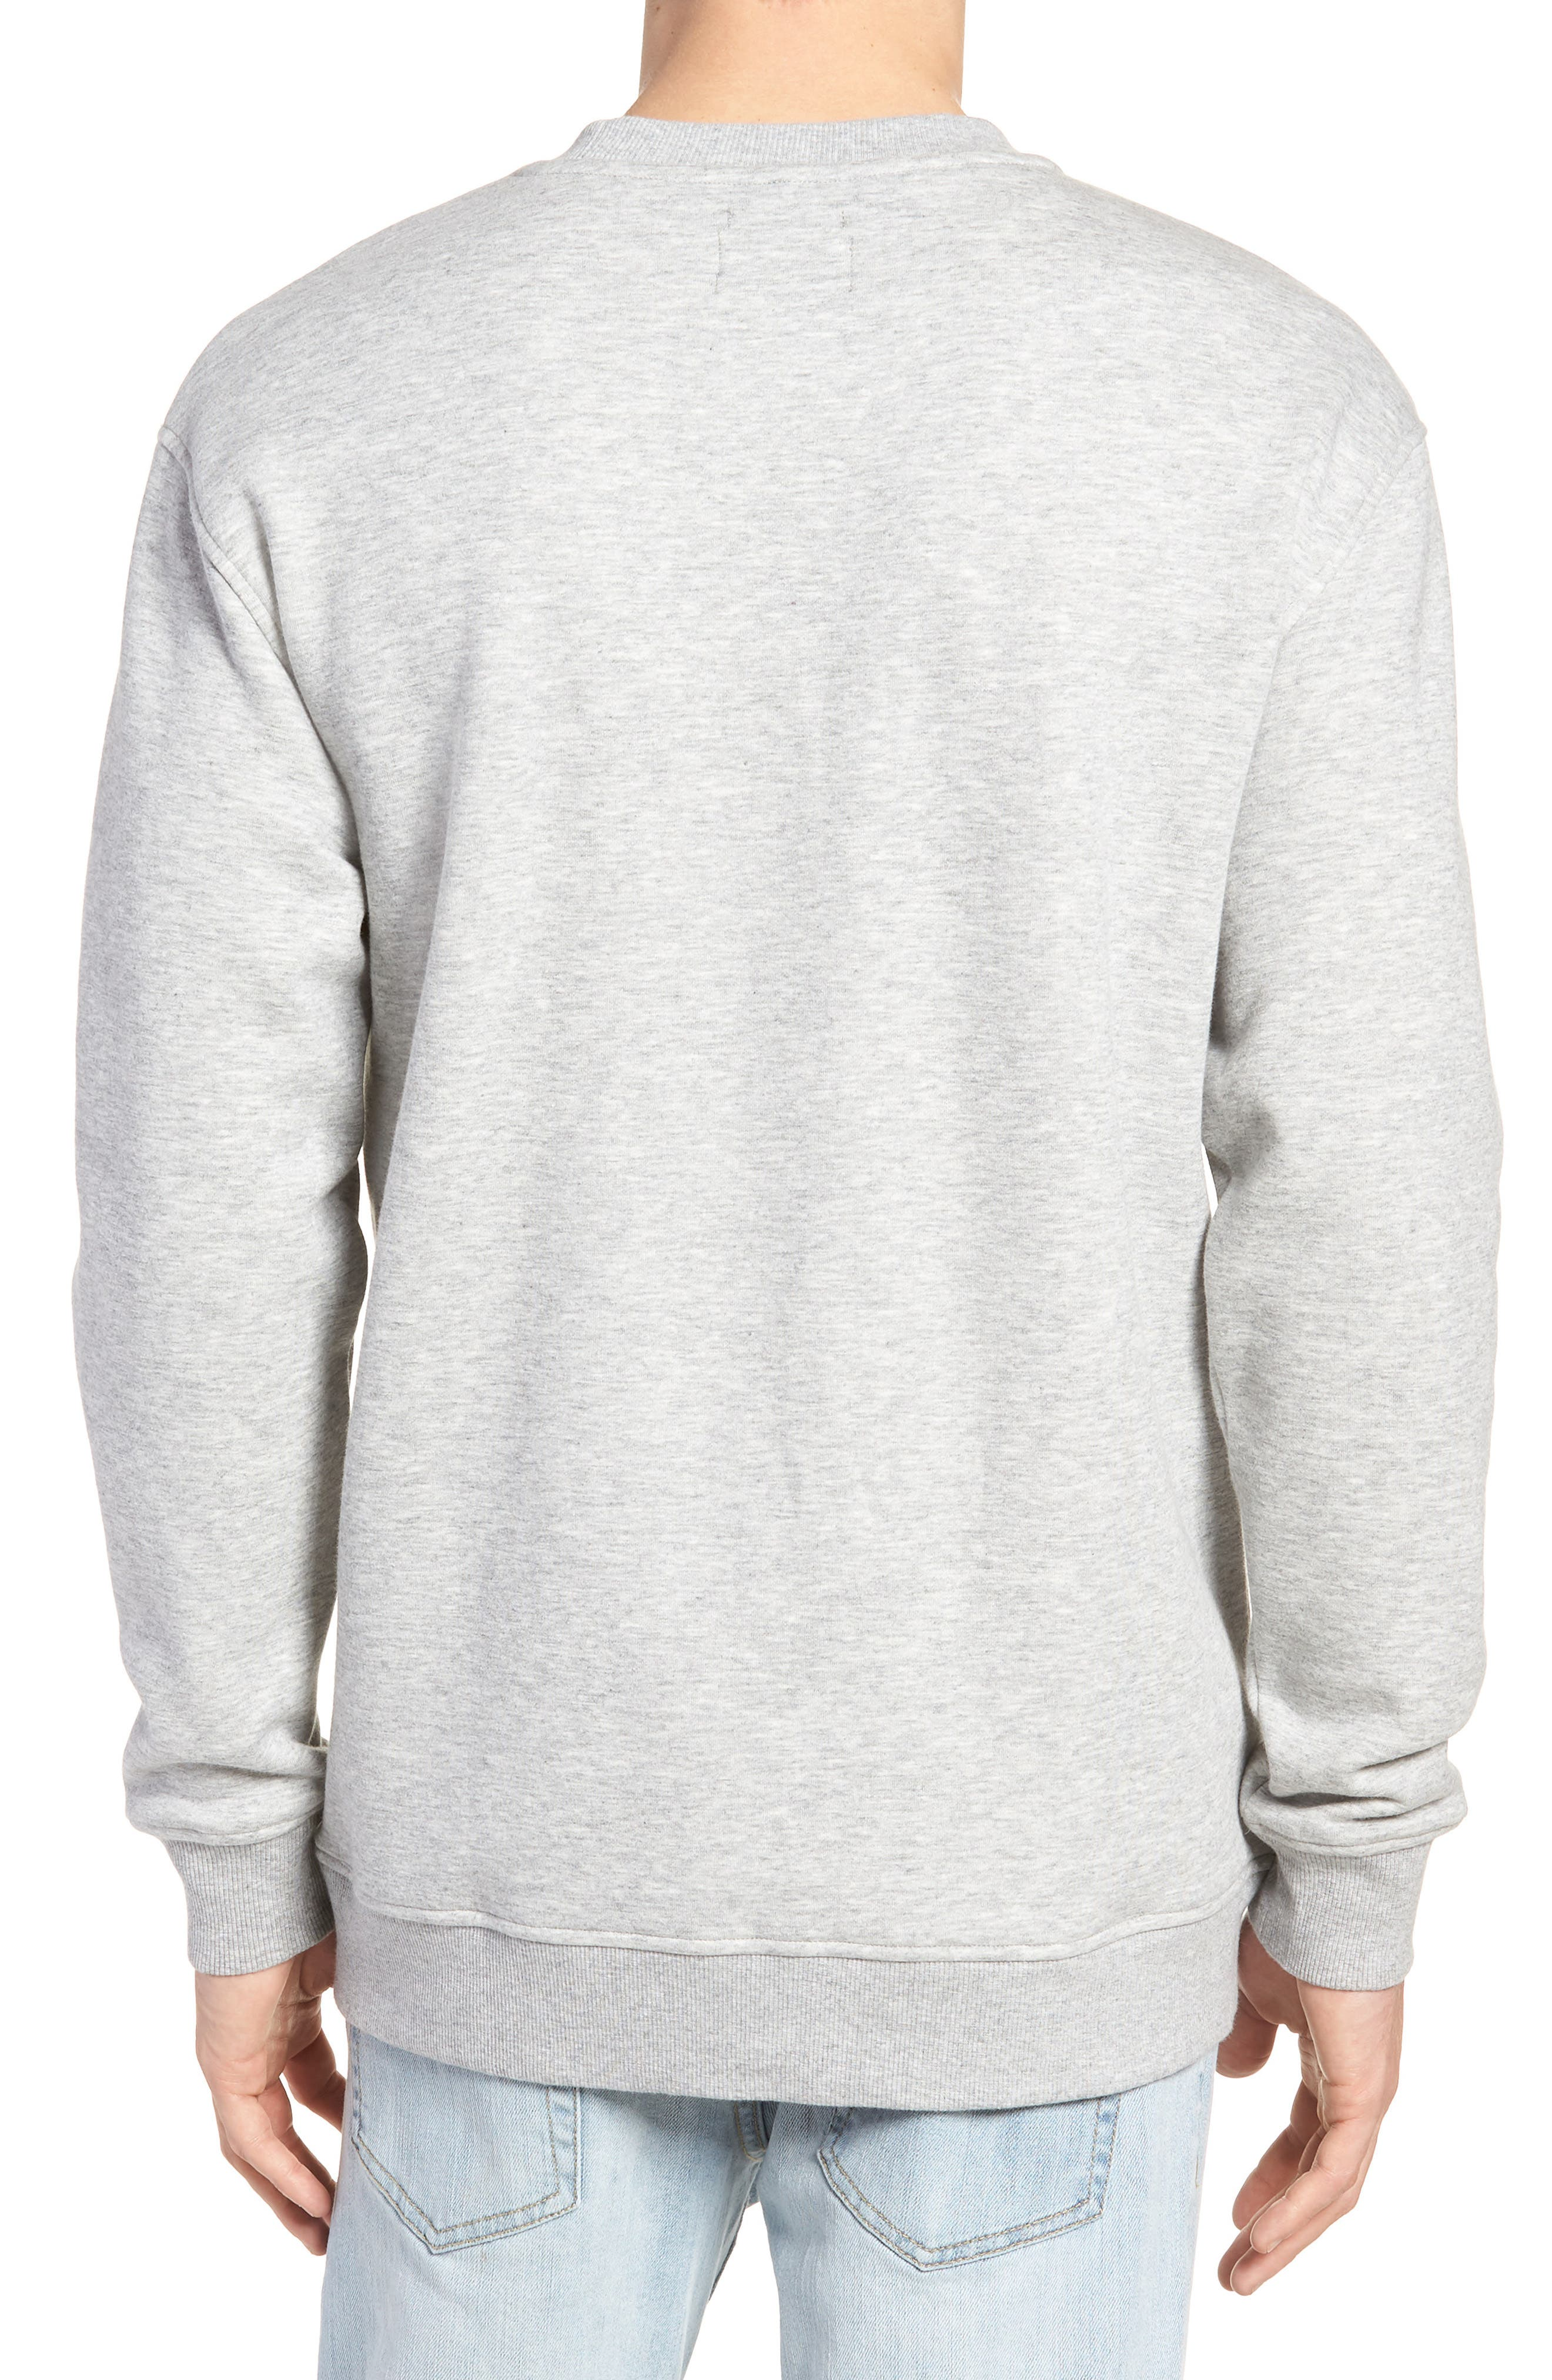 Tommy Classics Crewneck Sweatshirt,                             Alternate thumbnail 2, color,                             LIGHT GREY HEATHER